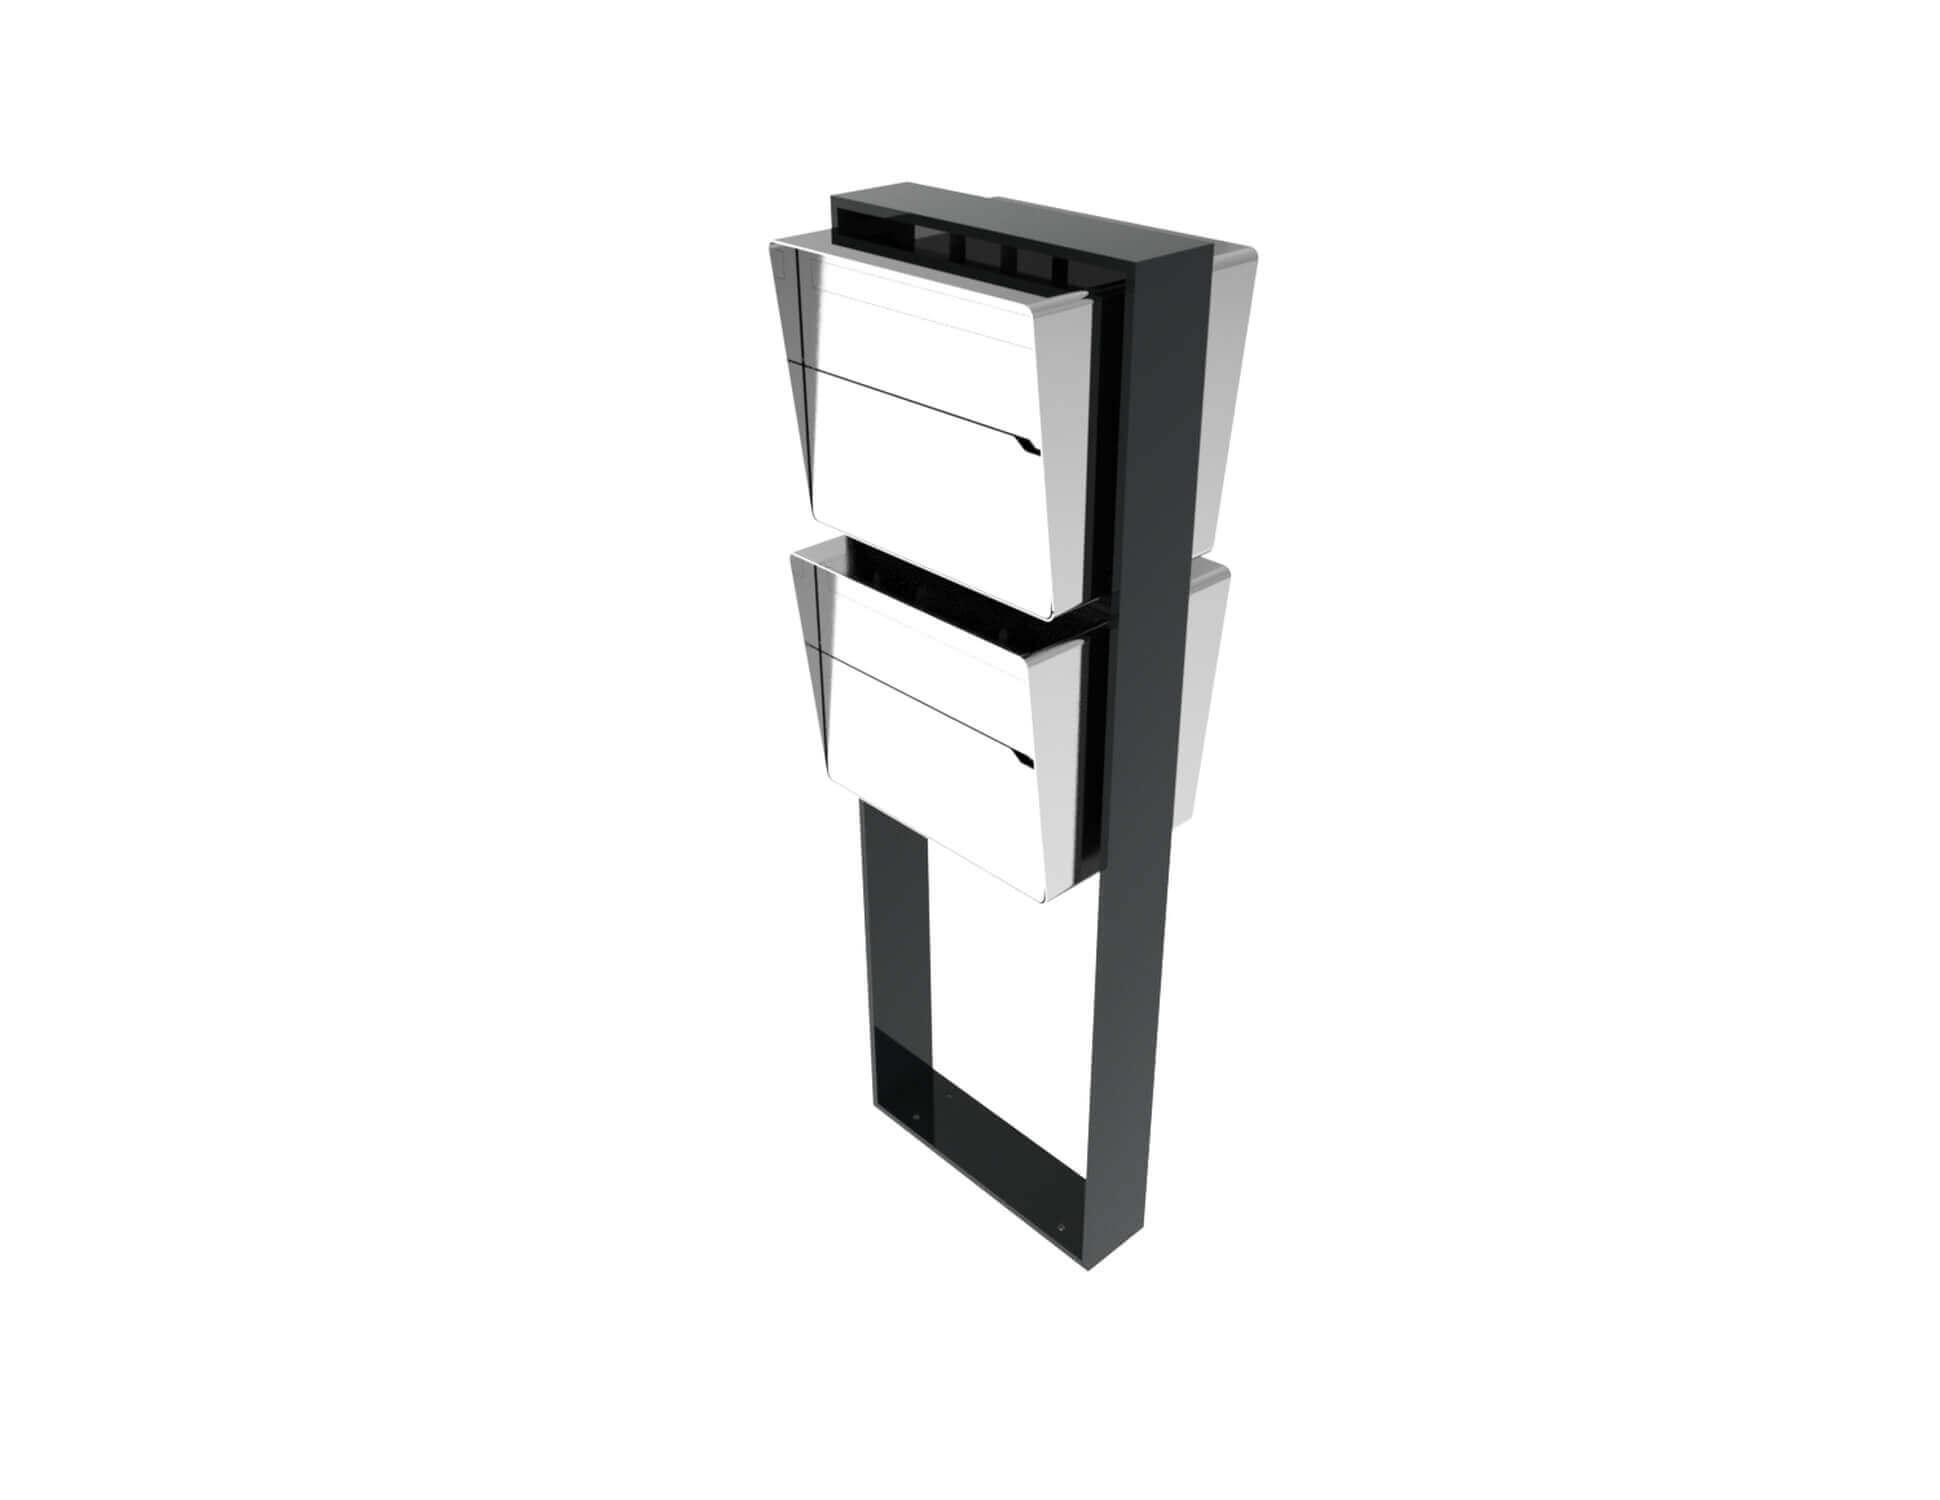 31 Designer Briefkastenanlage Bellus 2er Vertikal